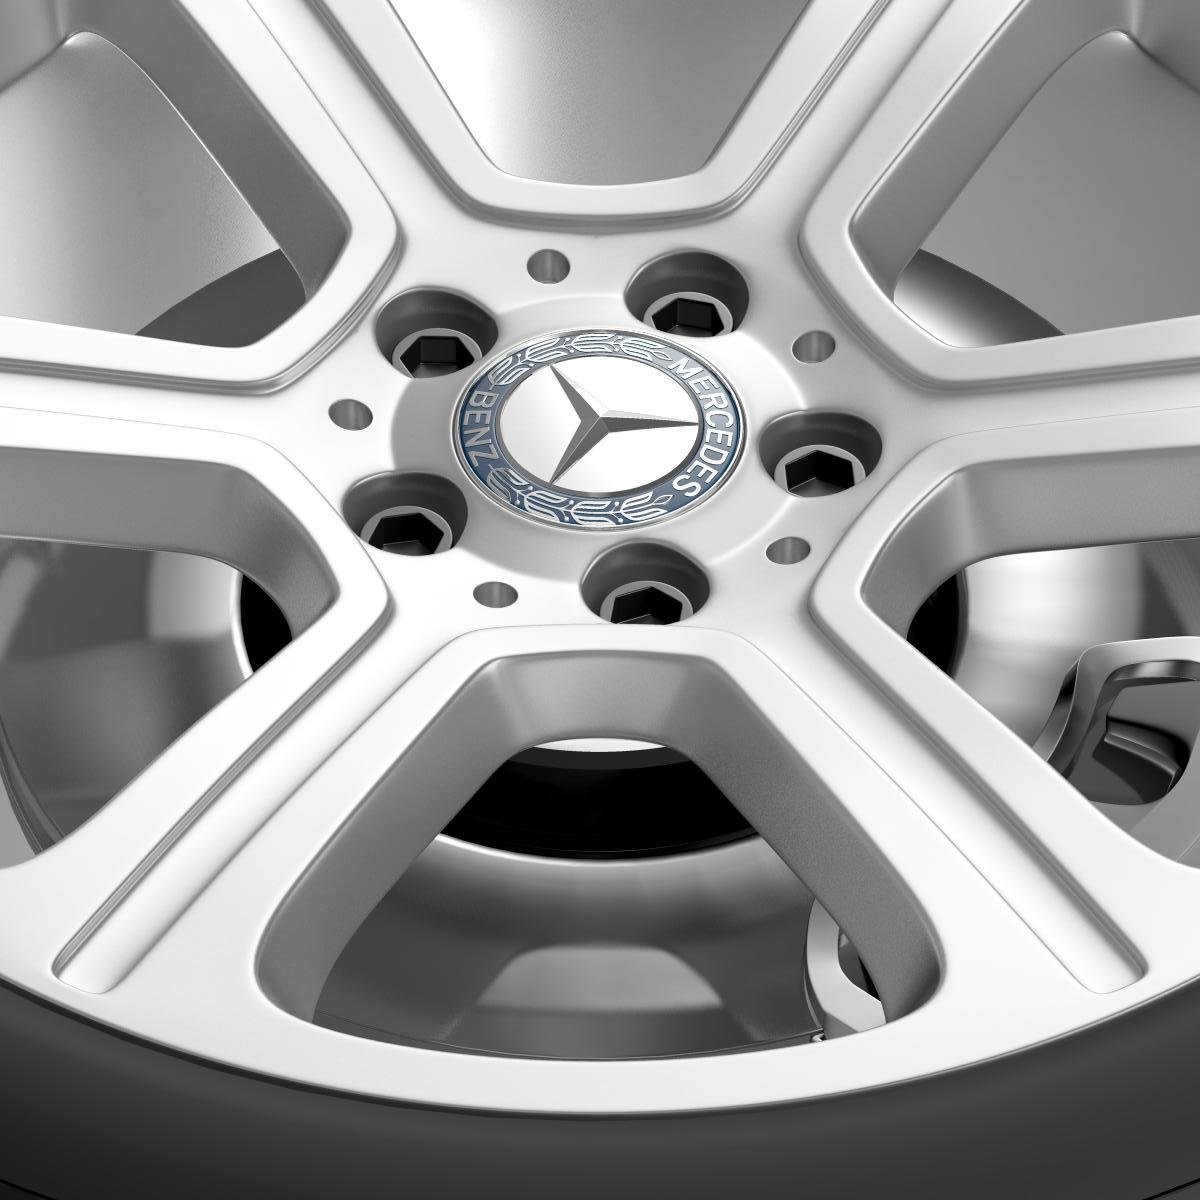 mercedes benz c 300 exclusive line wheel 3d model 3ds max fbx c4d lwo ma mb hrc xsi obj 210773